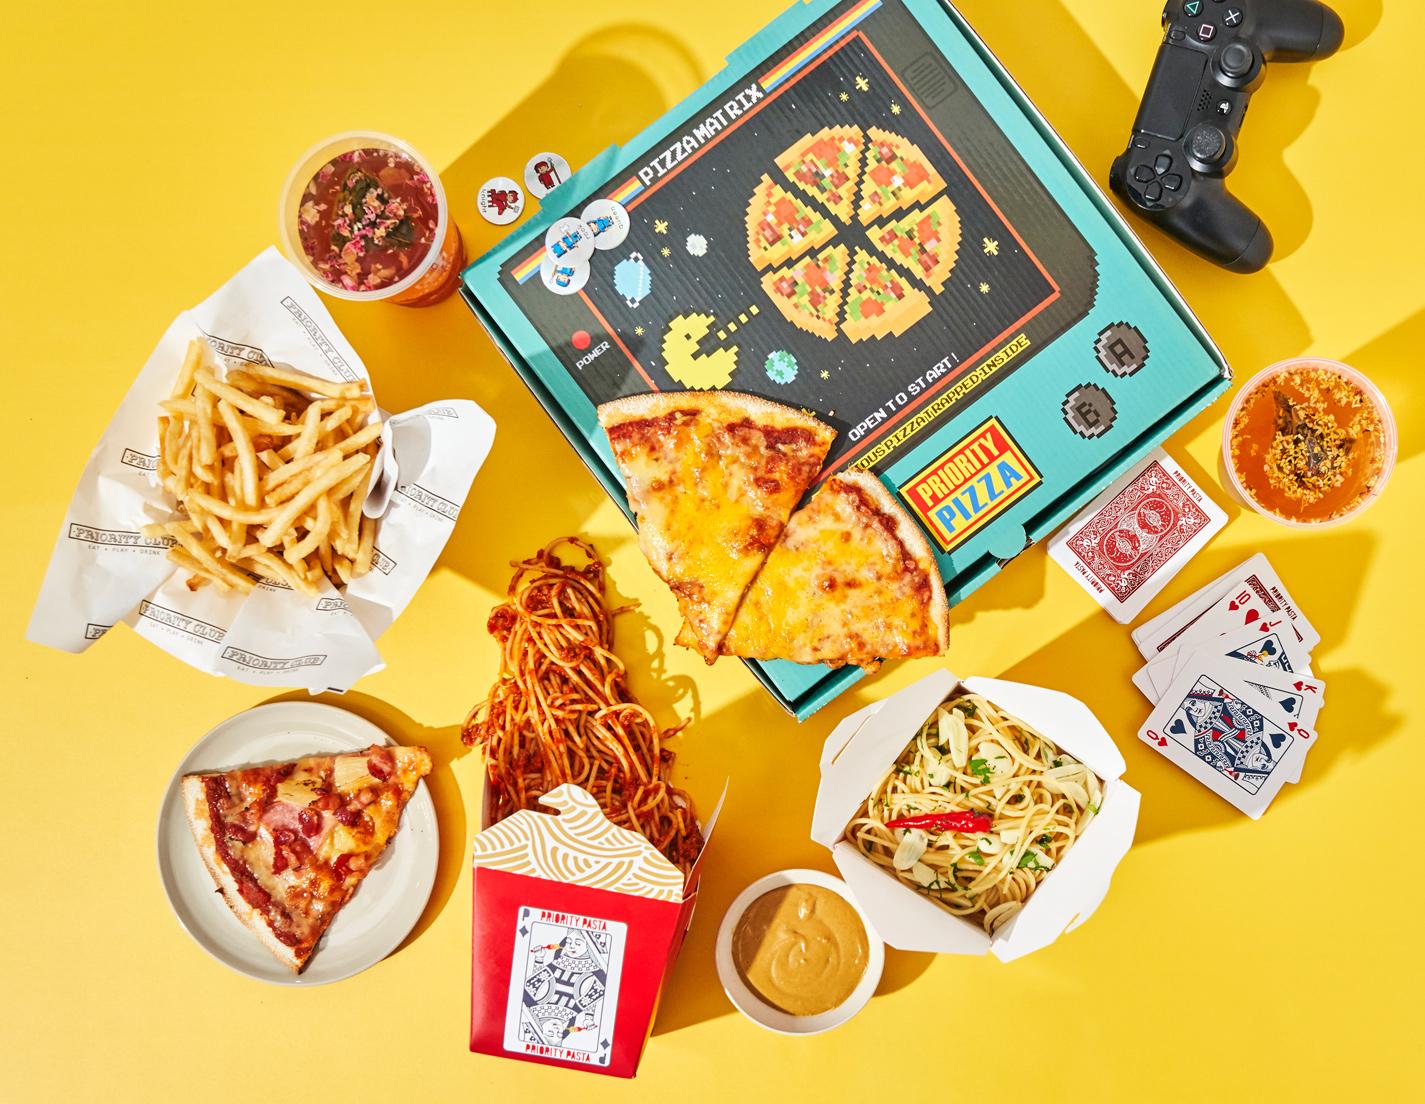 the priority club pizza april 2021 deals